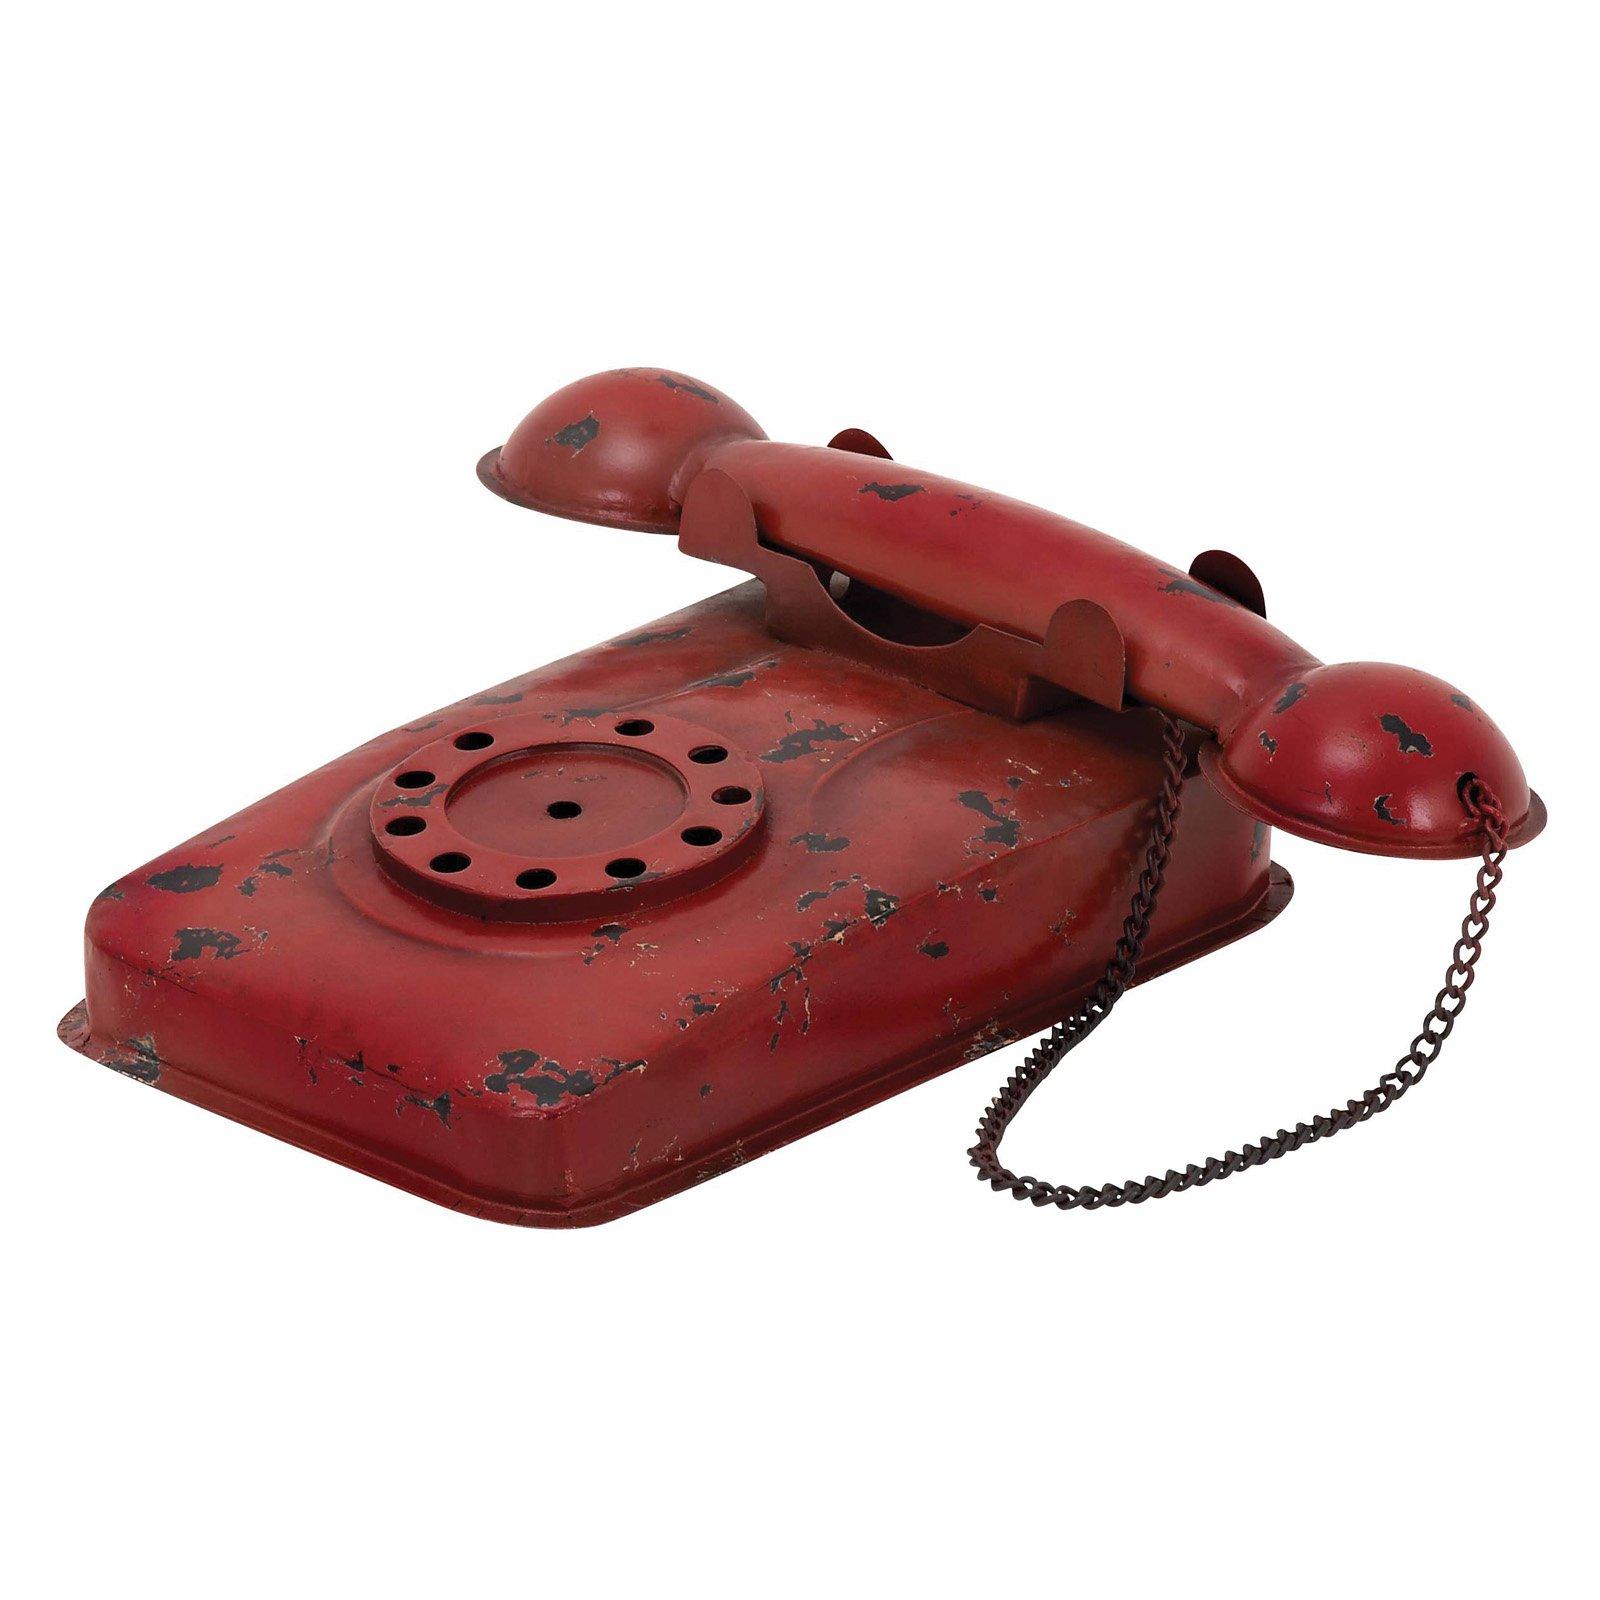 Woodland Imports Decorative Antique Red Phone Sculpture